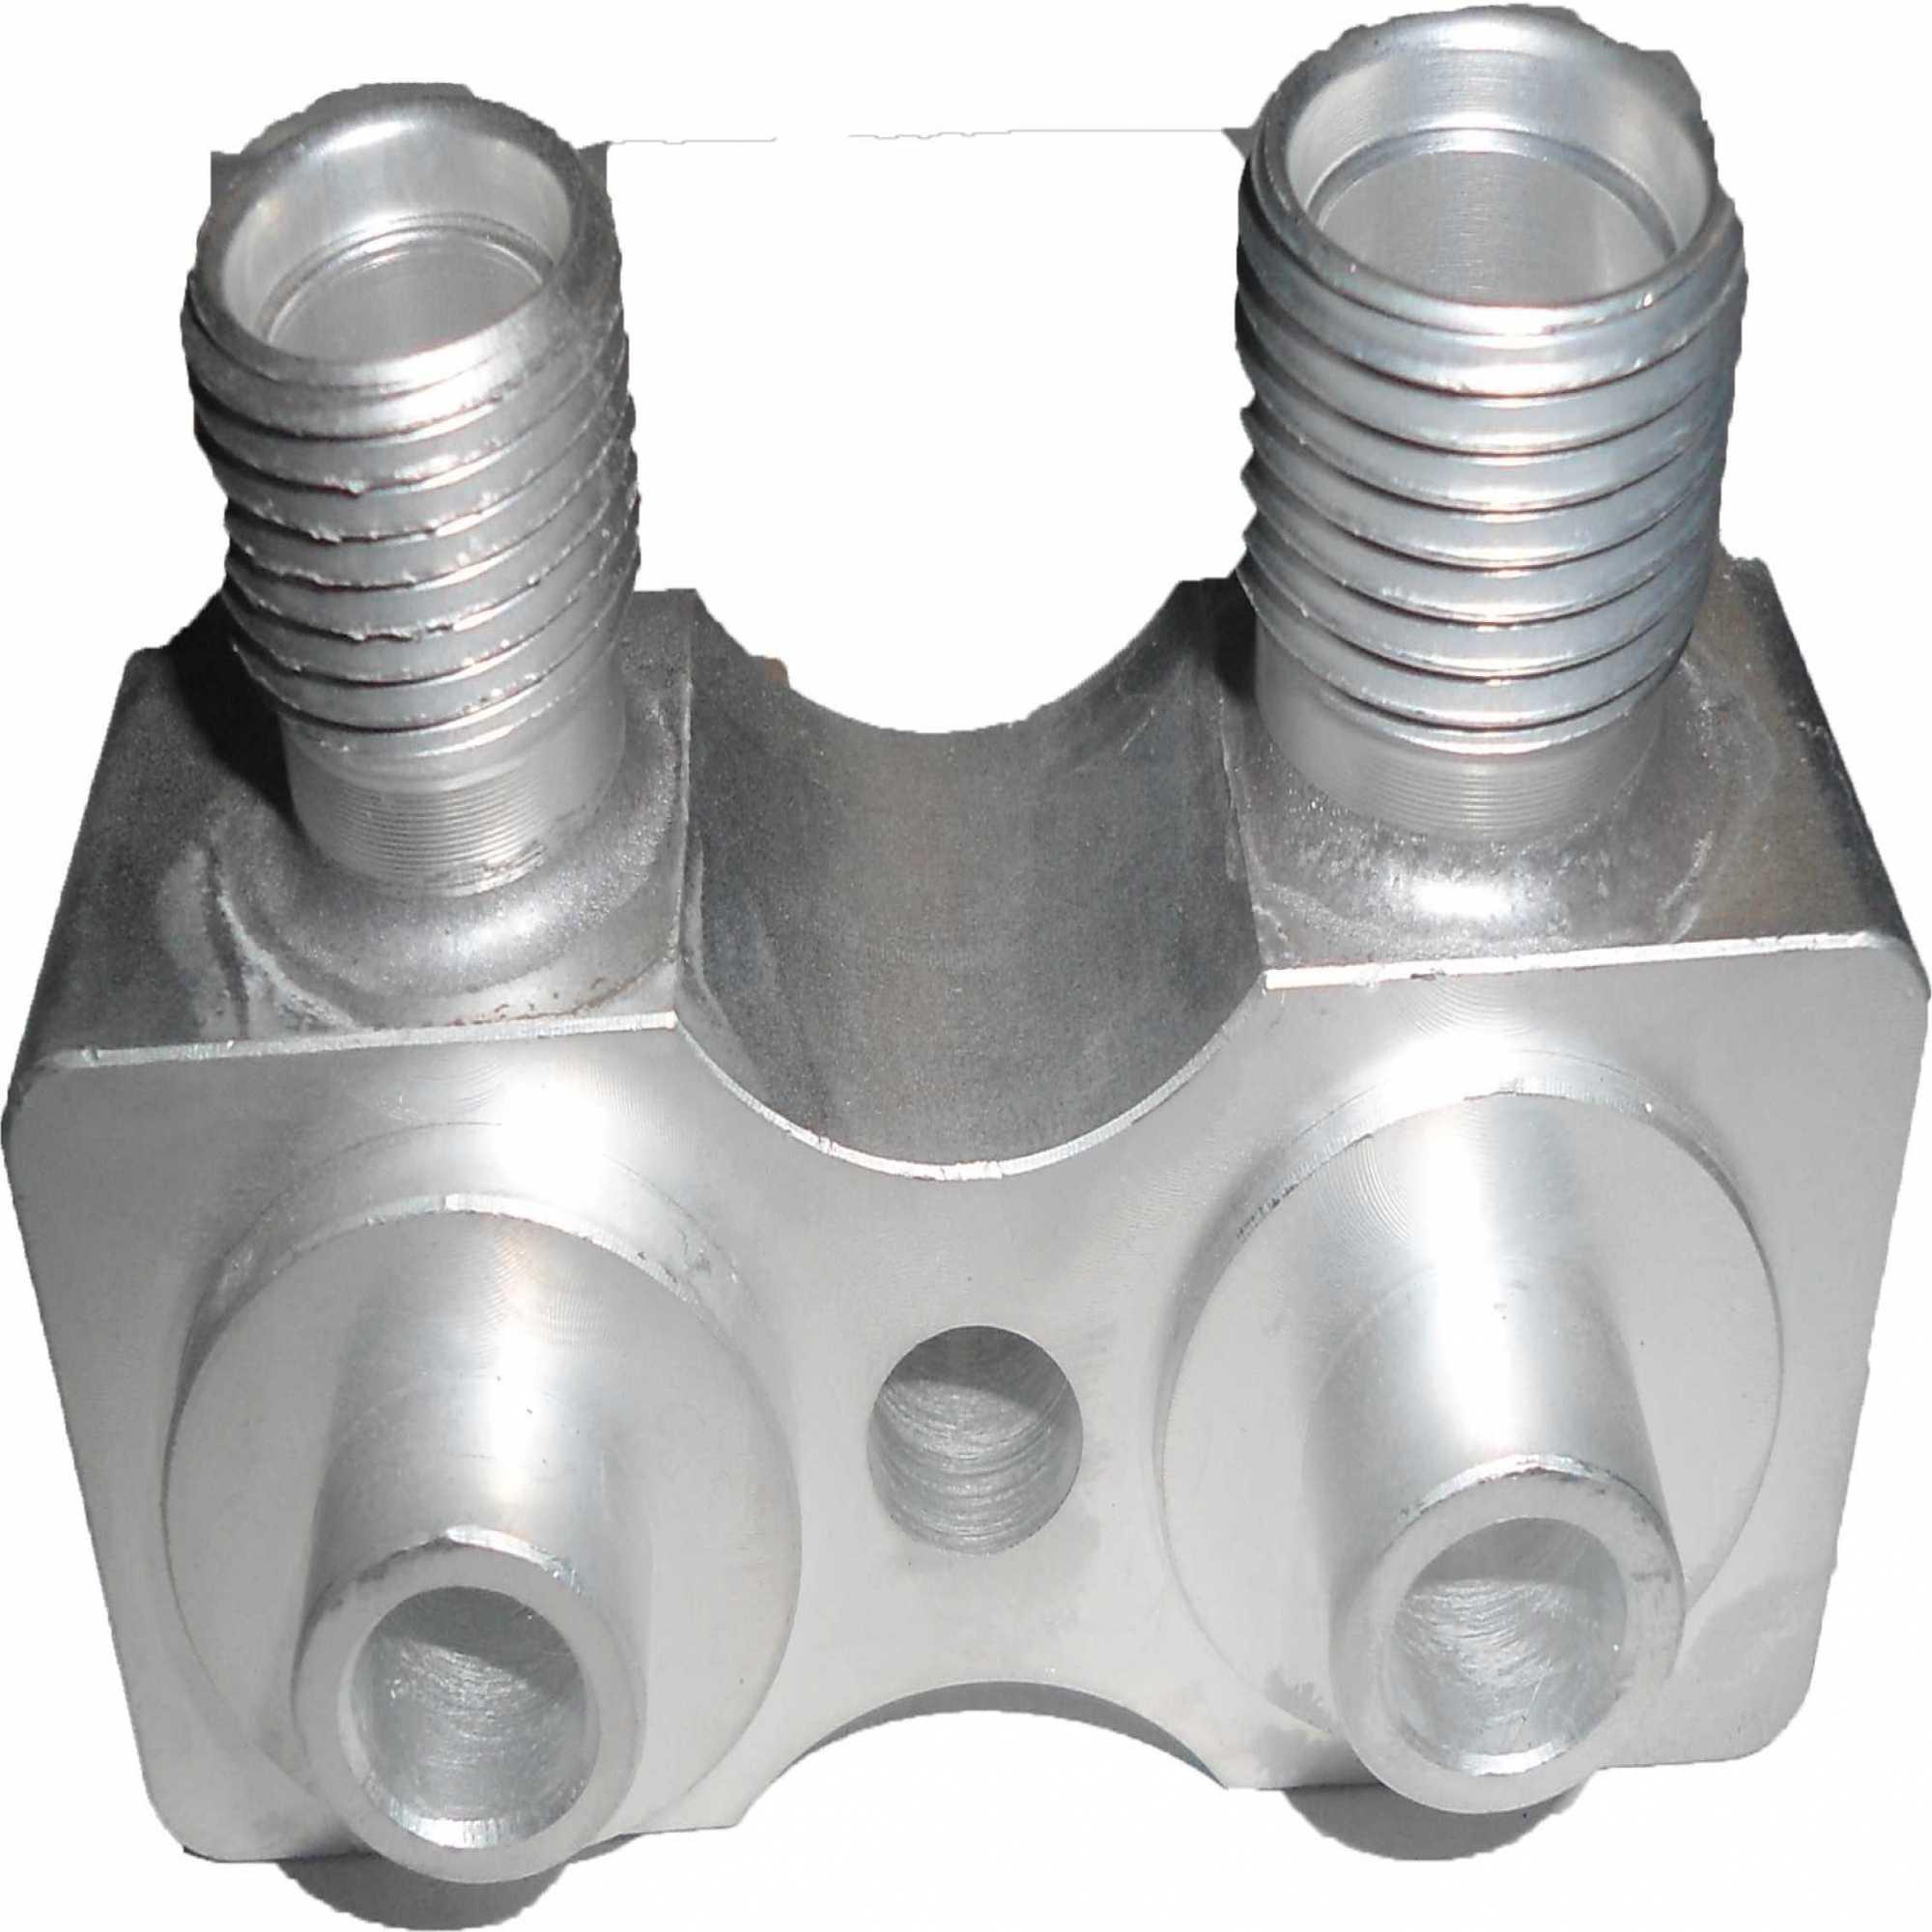 Valvula Conector - Corsa/Vectra/S10 2.4/2.8 Comp